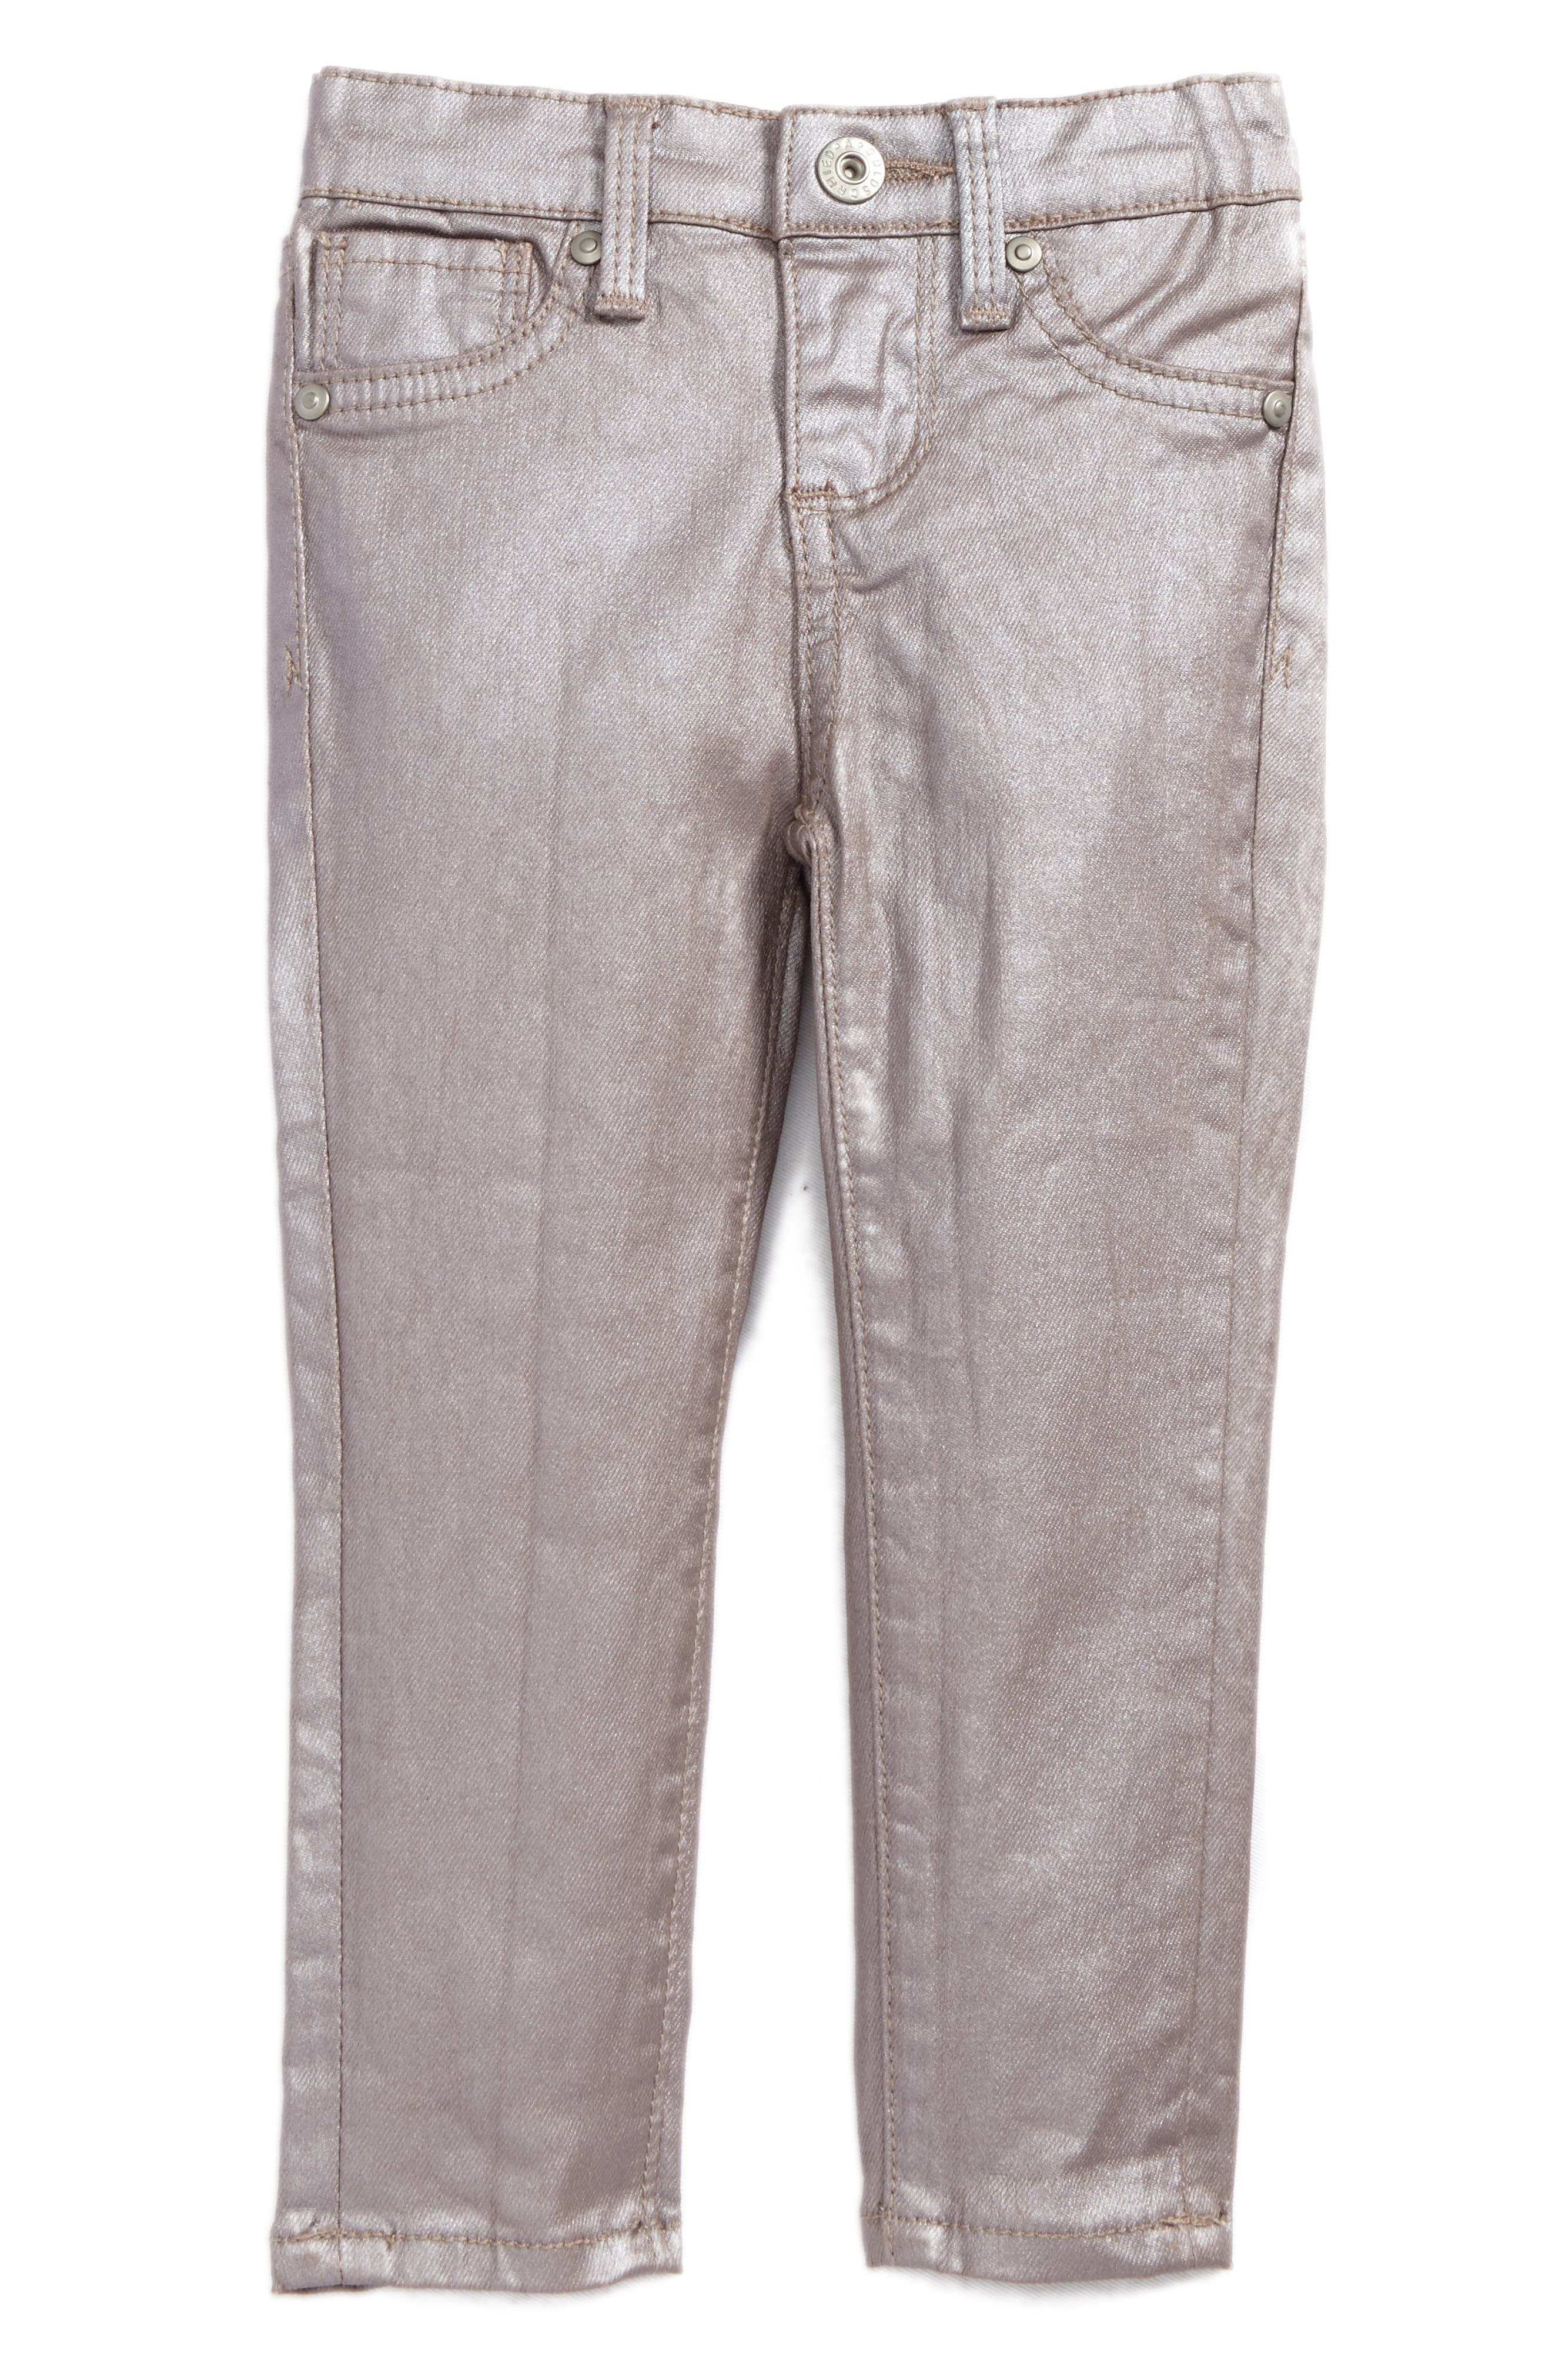 Main Image - ag adriano goldschmied kids The Sleek Twiggy Super Skinny Jeans (Baby Girls)